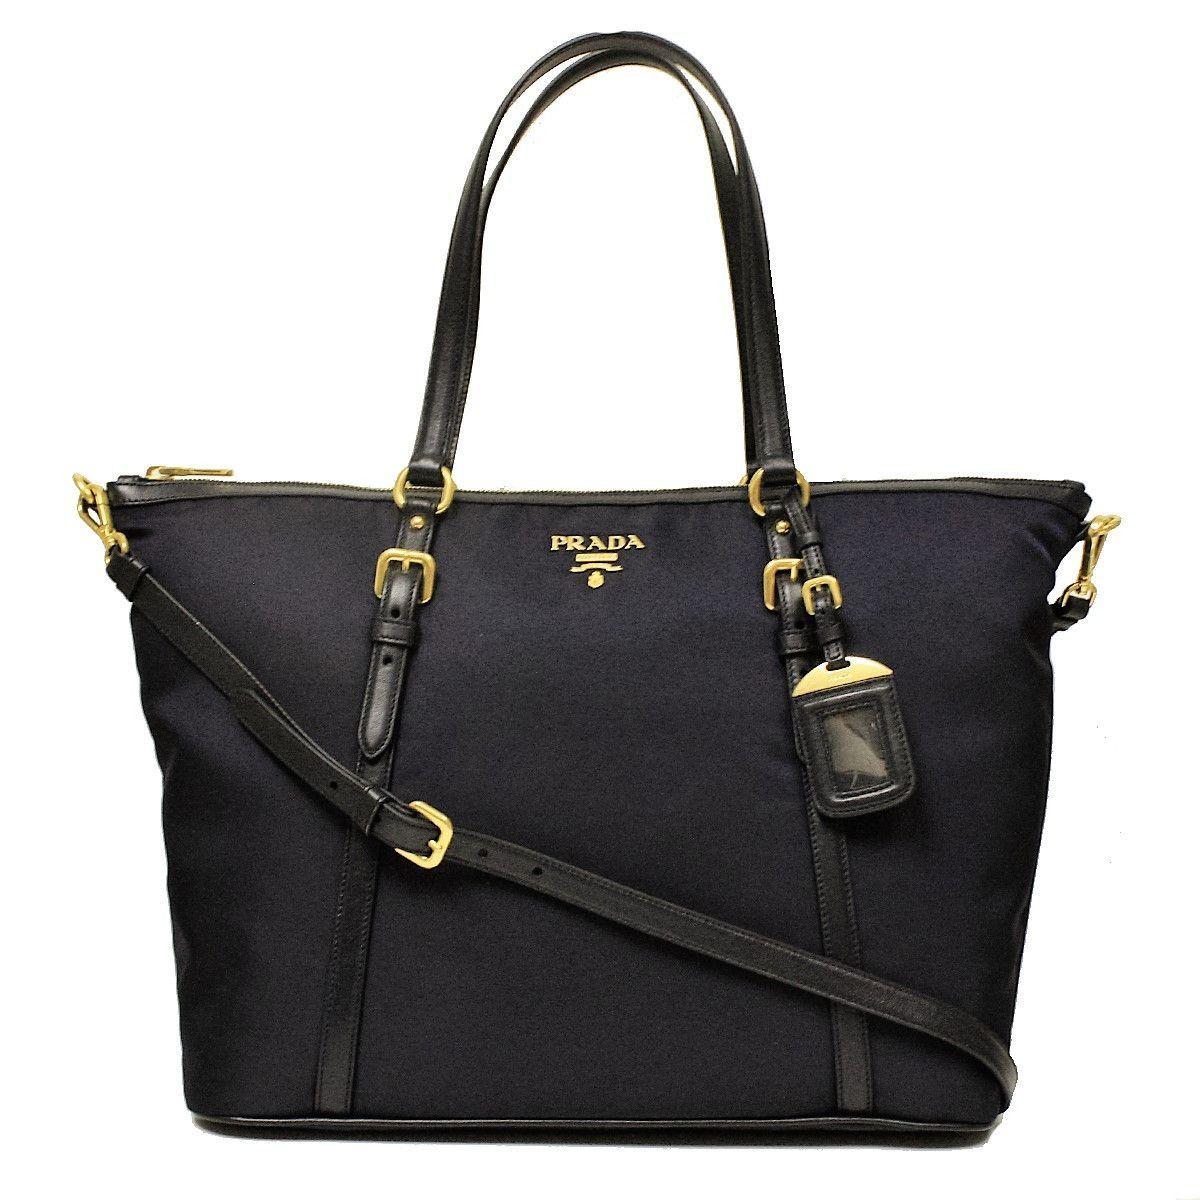 afae99e242 Prada Tessuto Soft Calf Leather Shopping Tote Bag